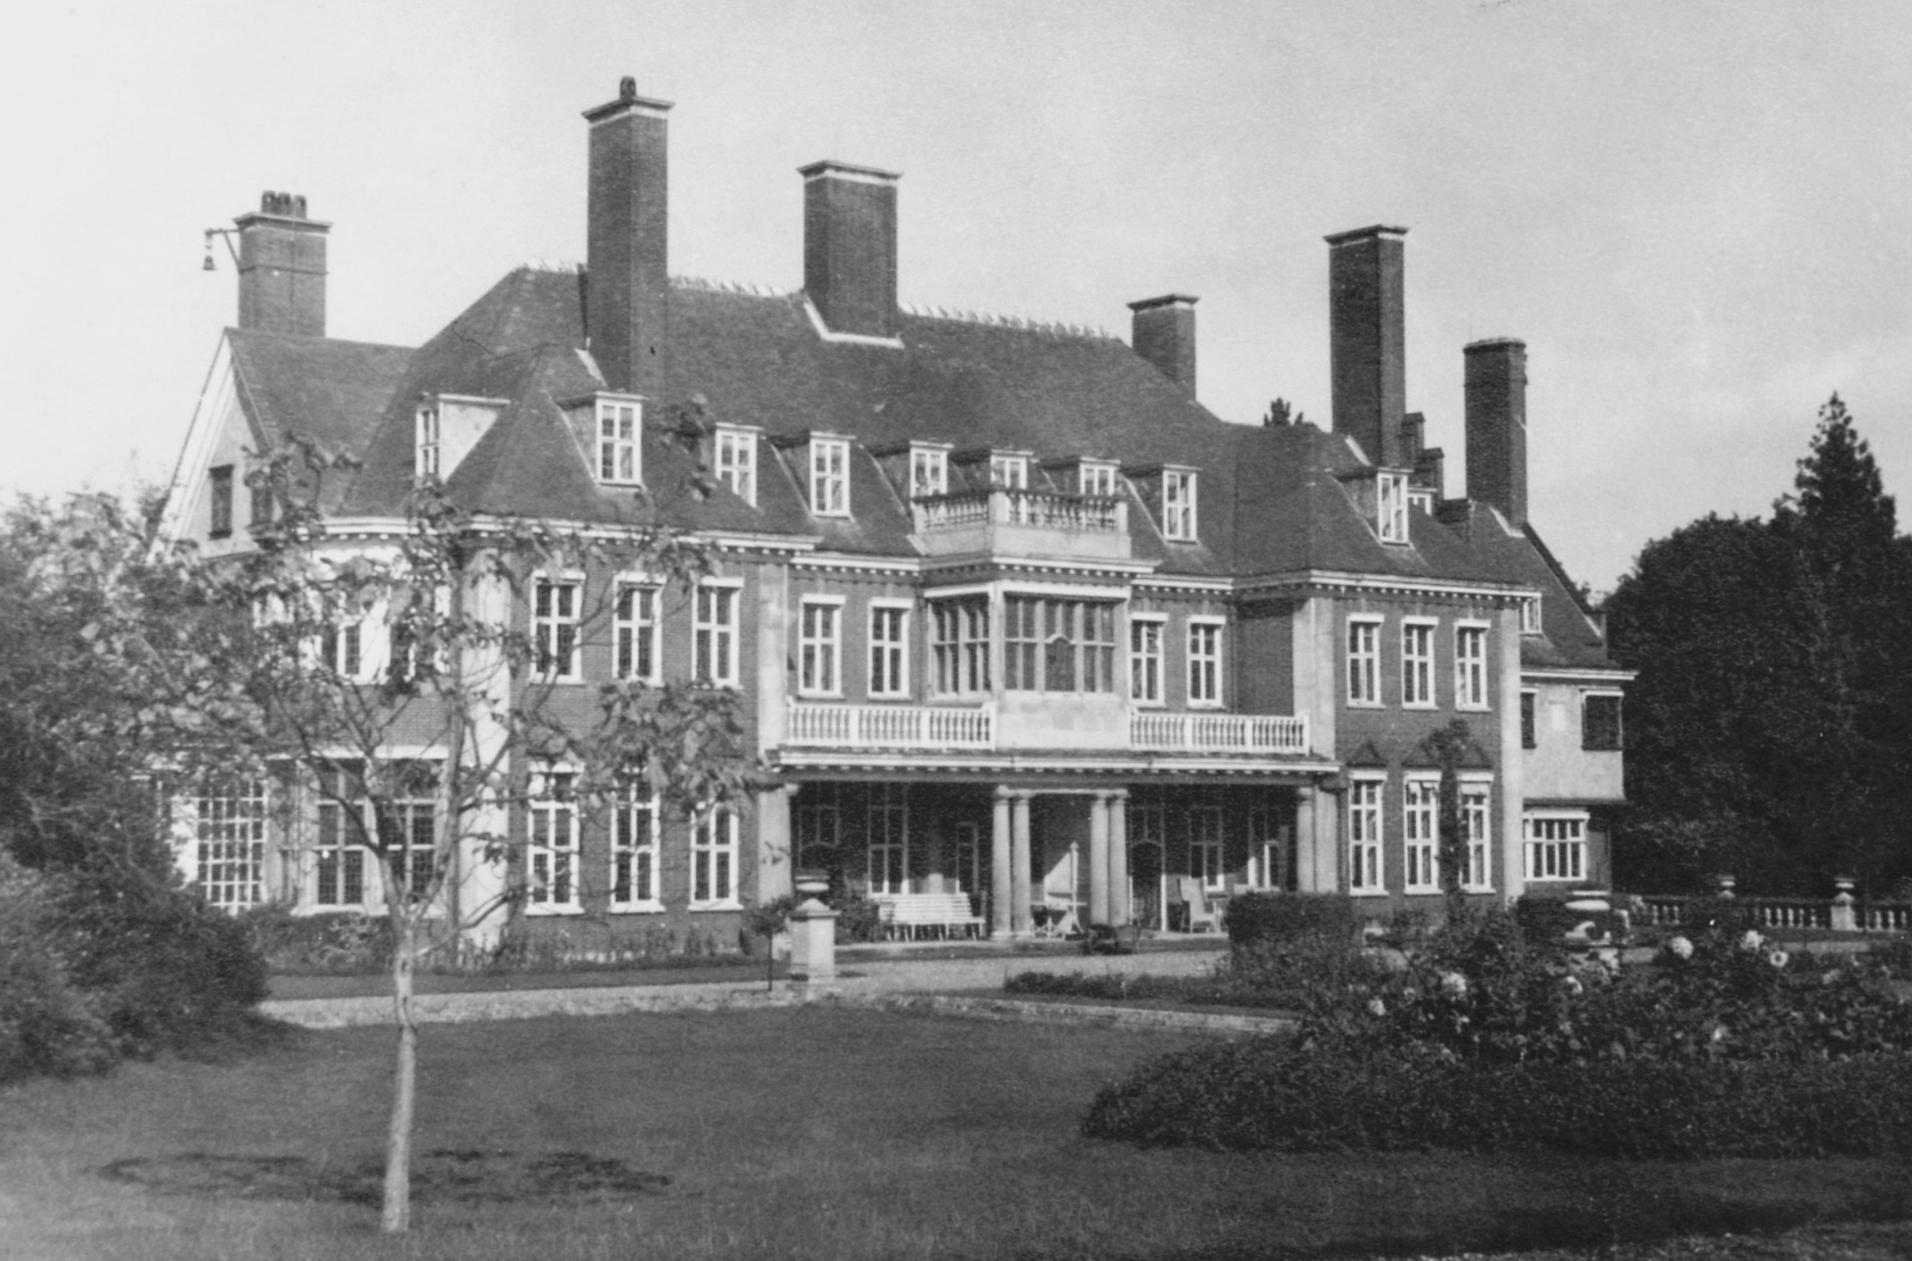 Cavenham Hall